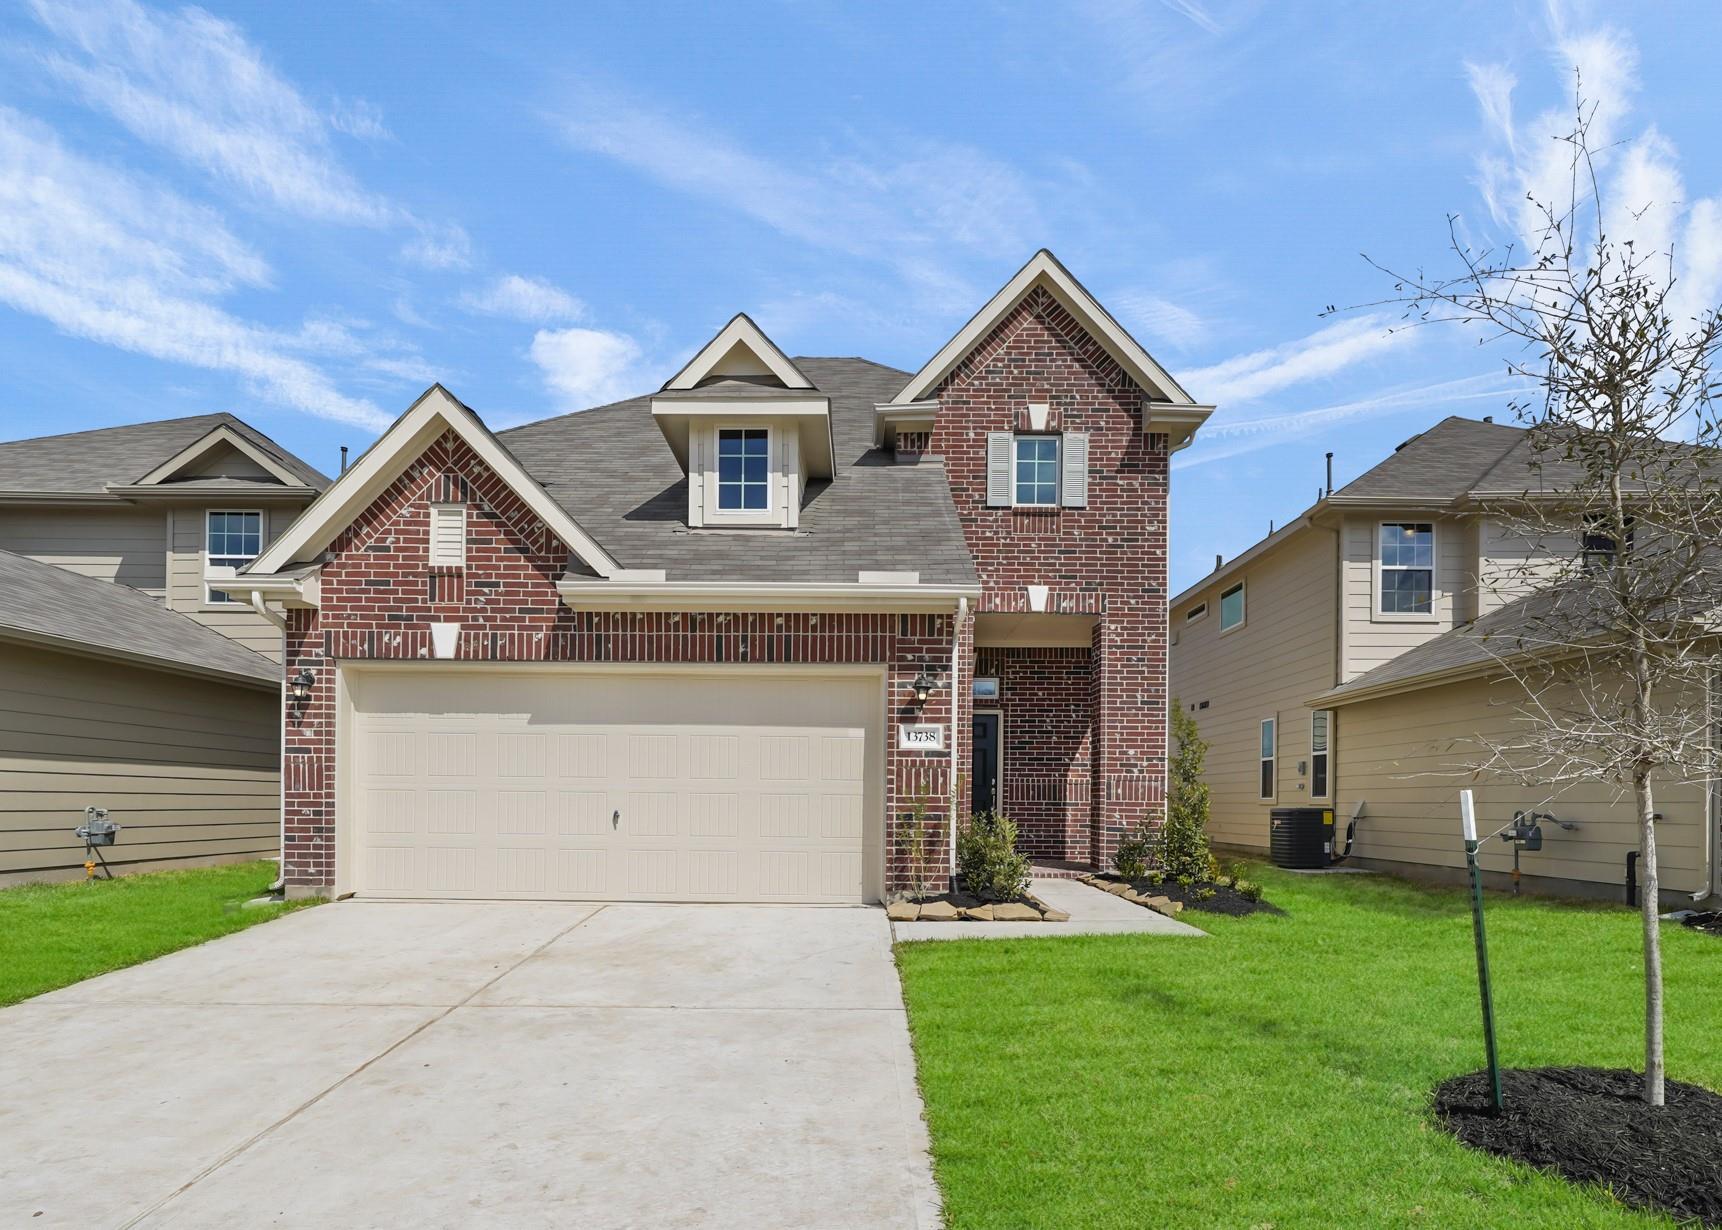 13738 Evansdale Lane Property Photo - Houston, TX real estate listing